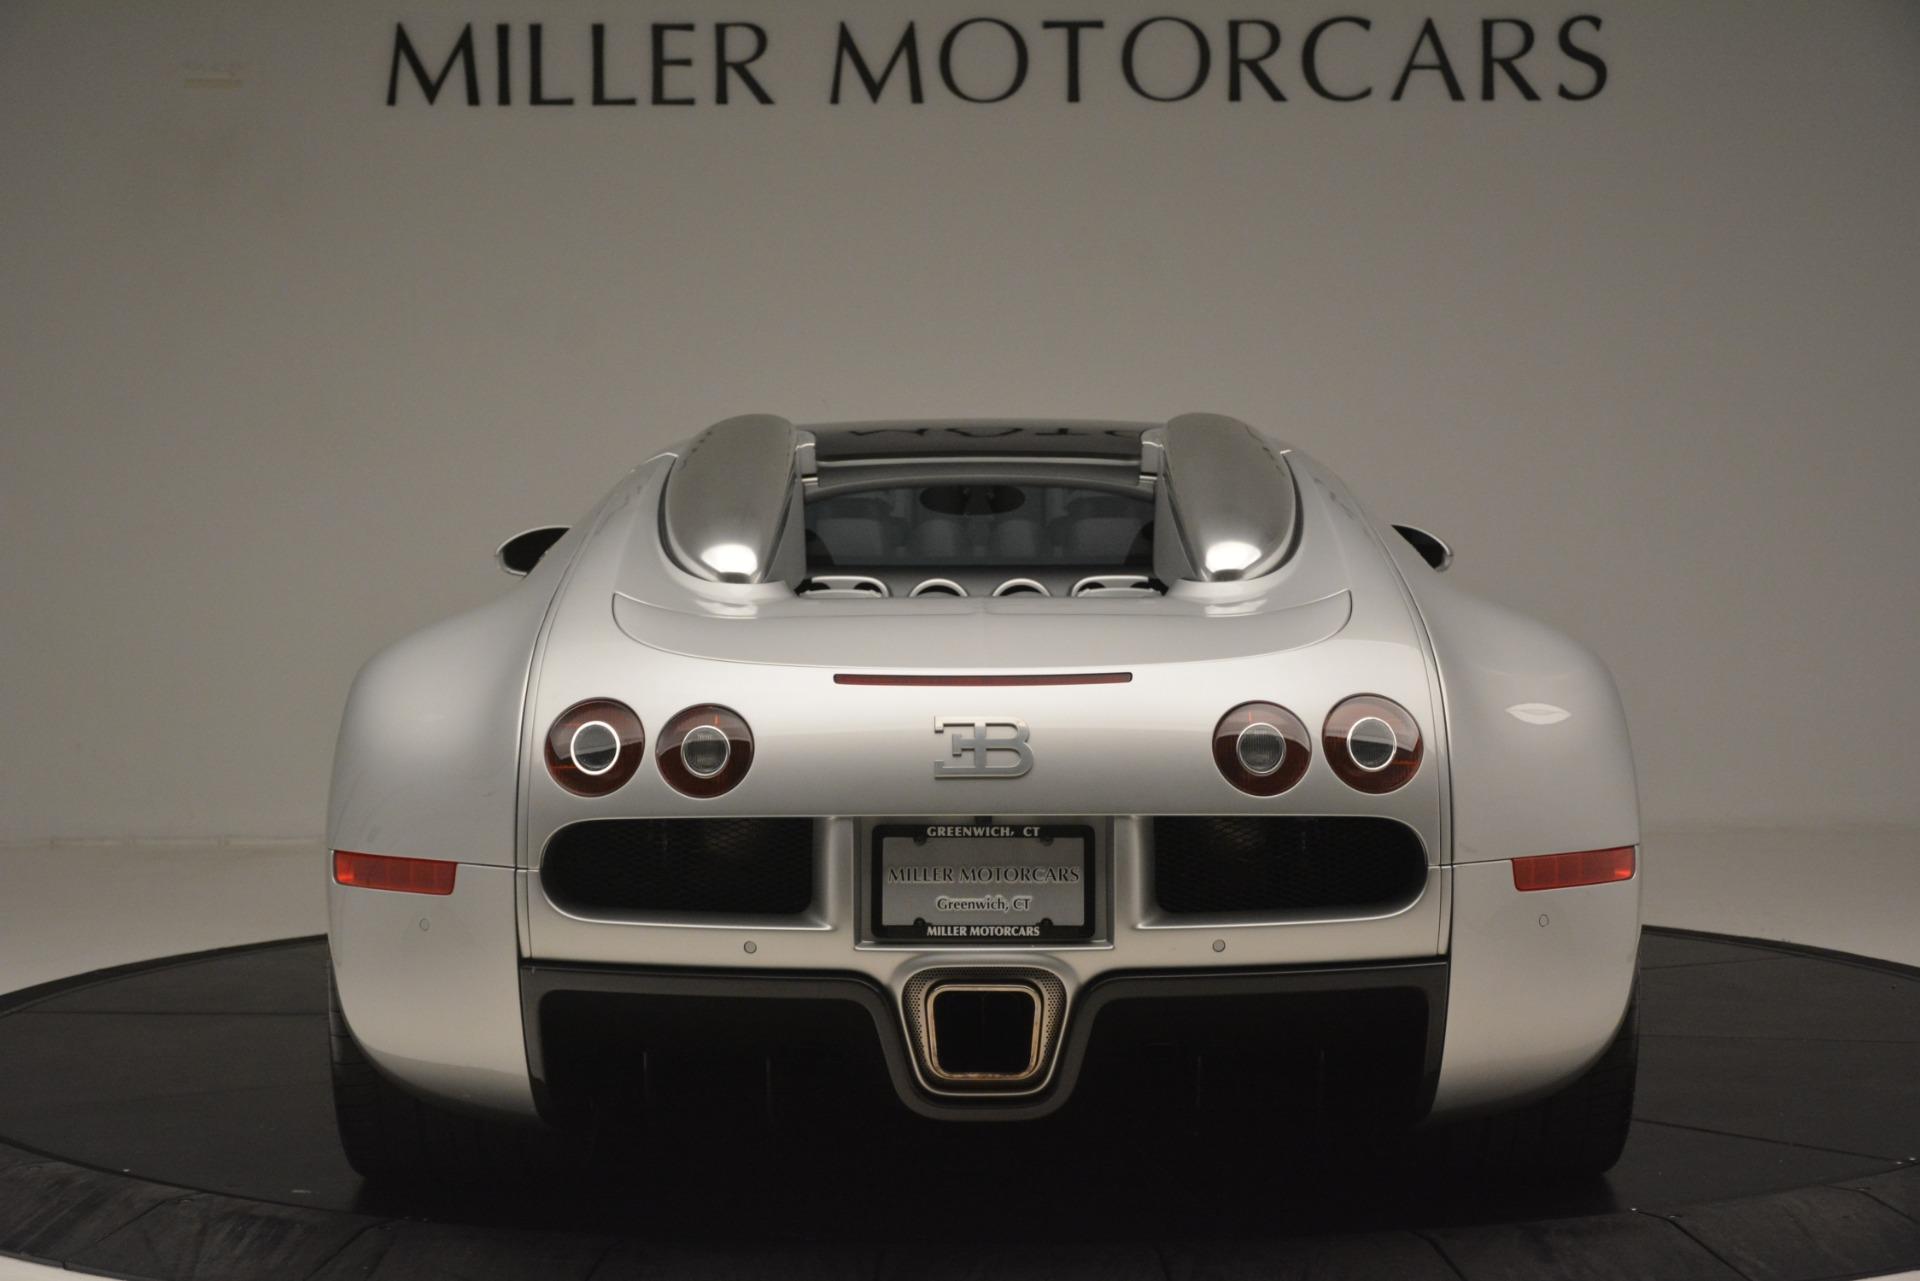 Used 2010 Bugatti Veyron 16.4 Grand Sport For Sale In Greenwich, CT 3159_p17